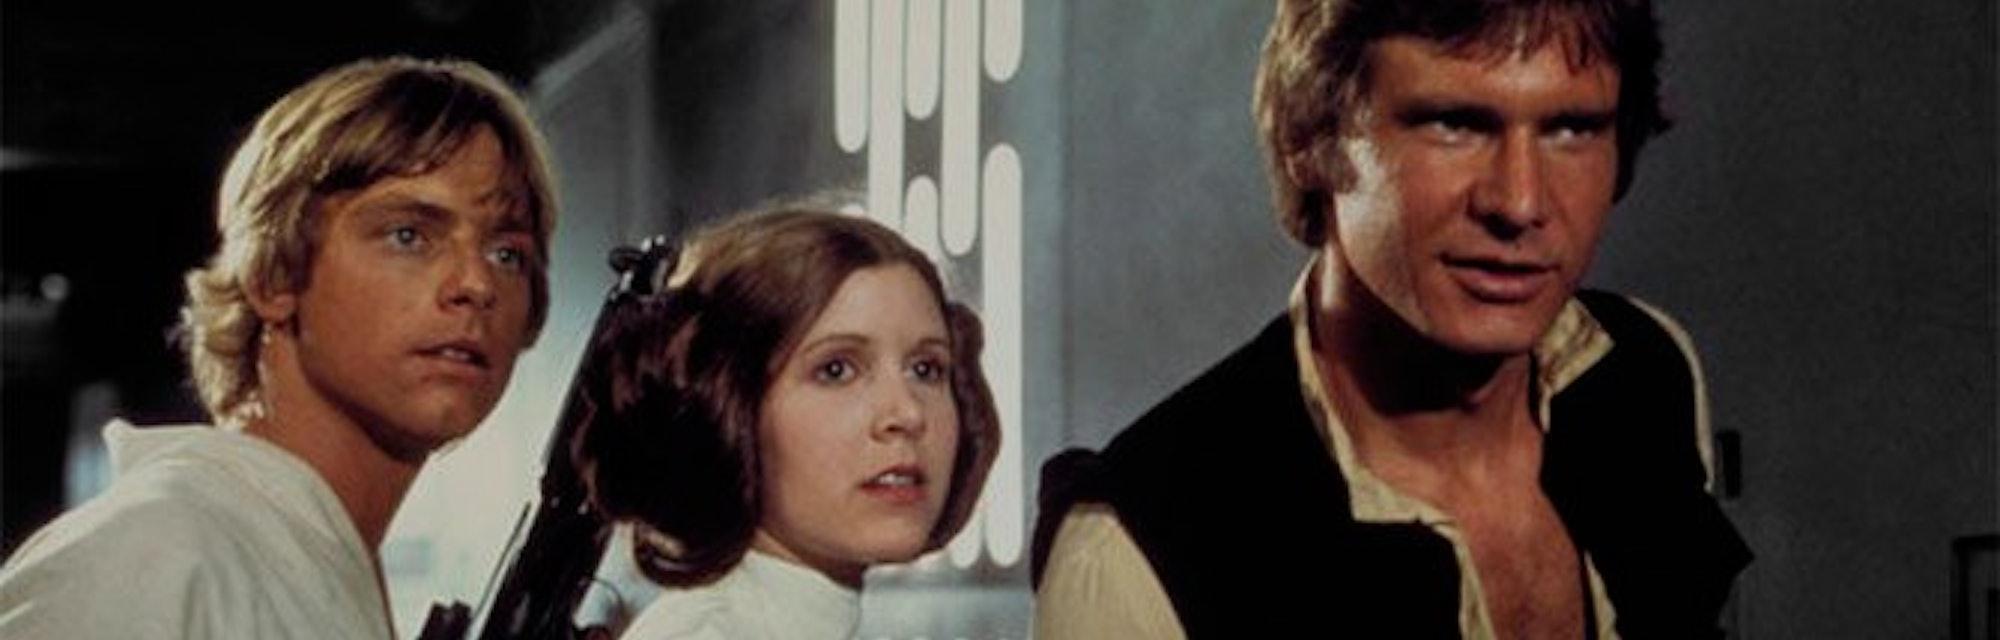 Mandalorian Timeline In Star Wars Where Are Luke Leia Han Palpatine Ahsoka And More